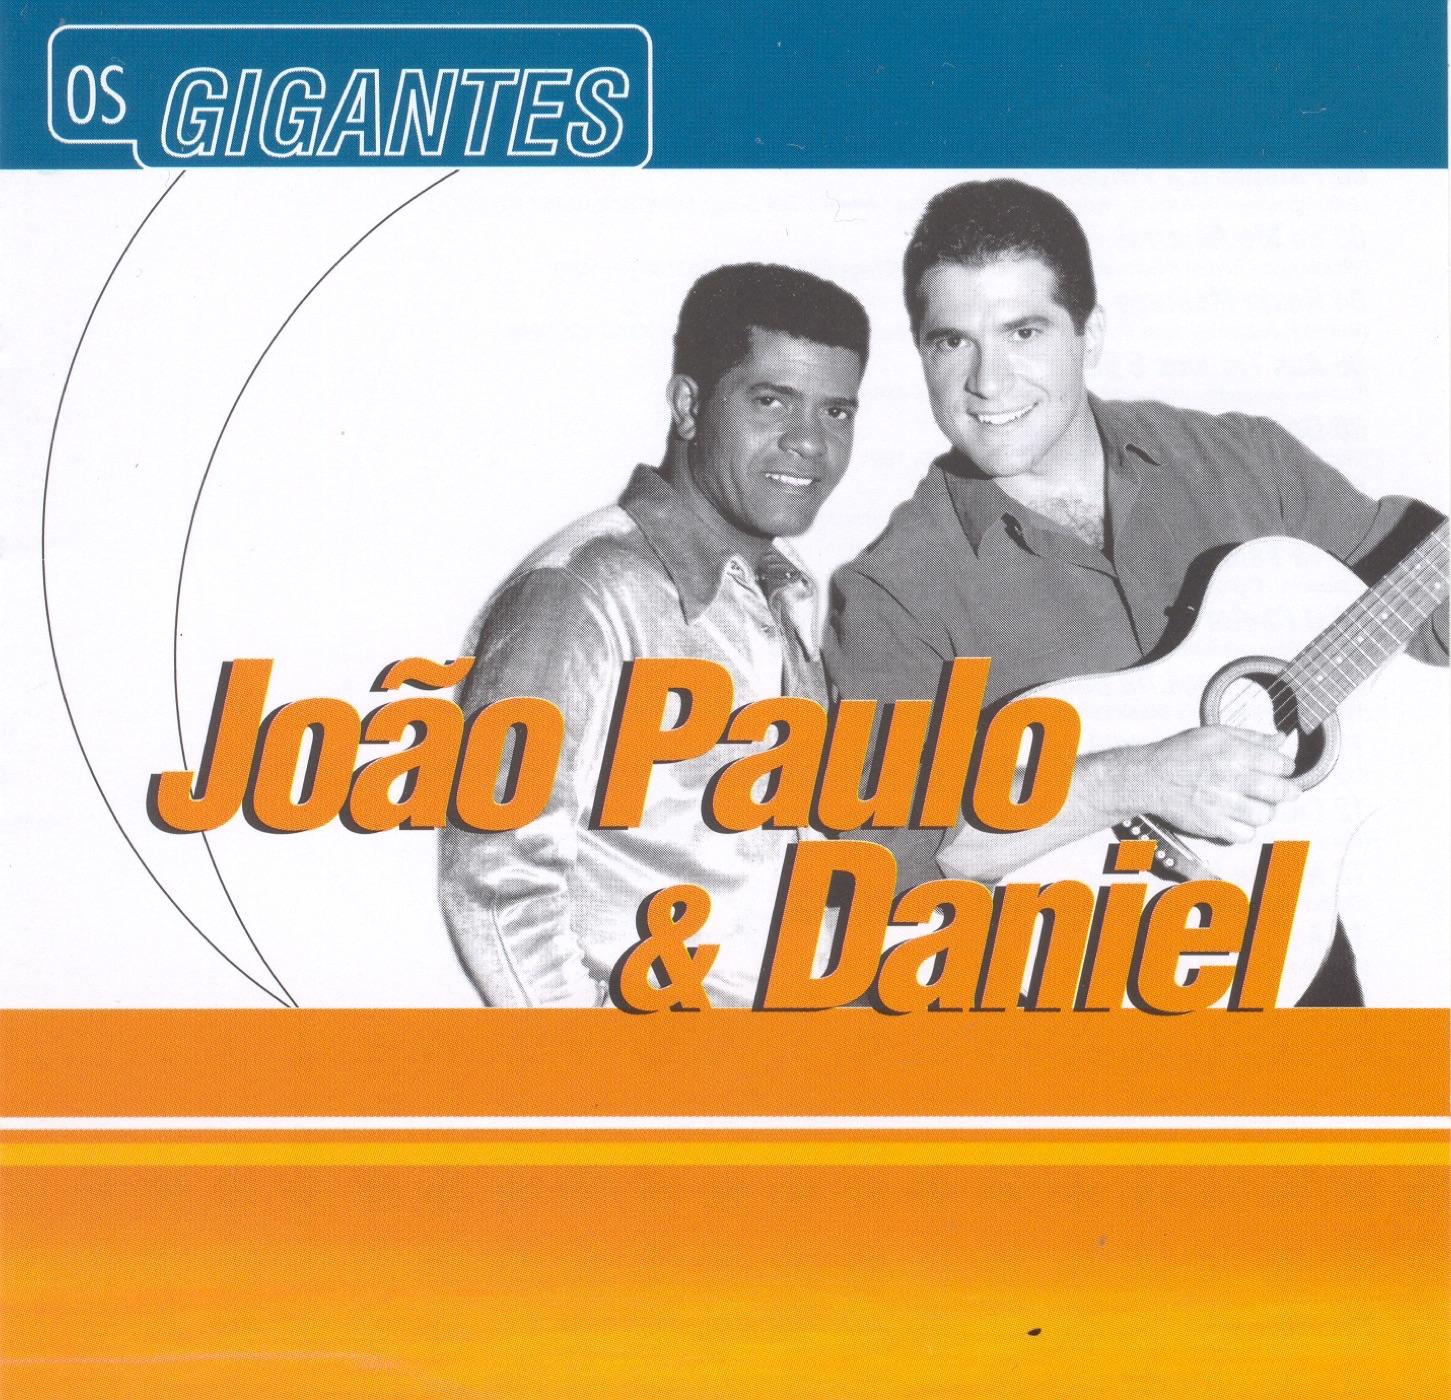 Gigantes: João Paulo & Daniel